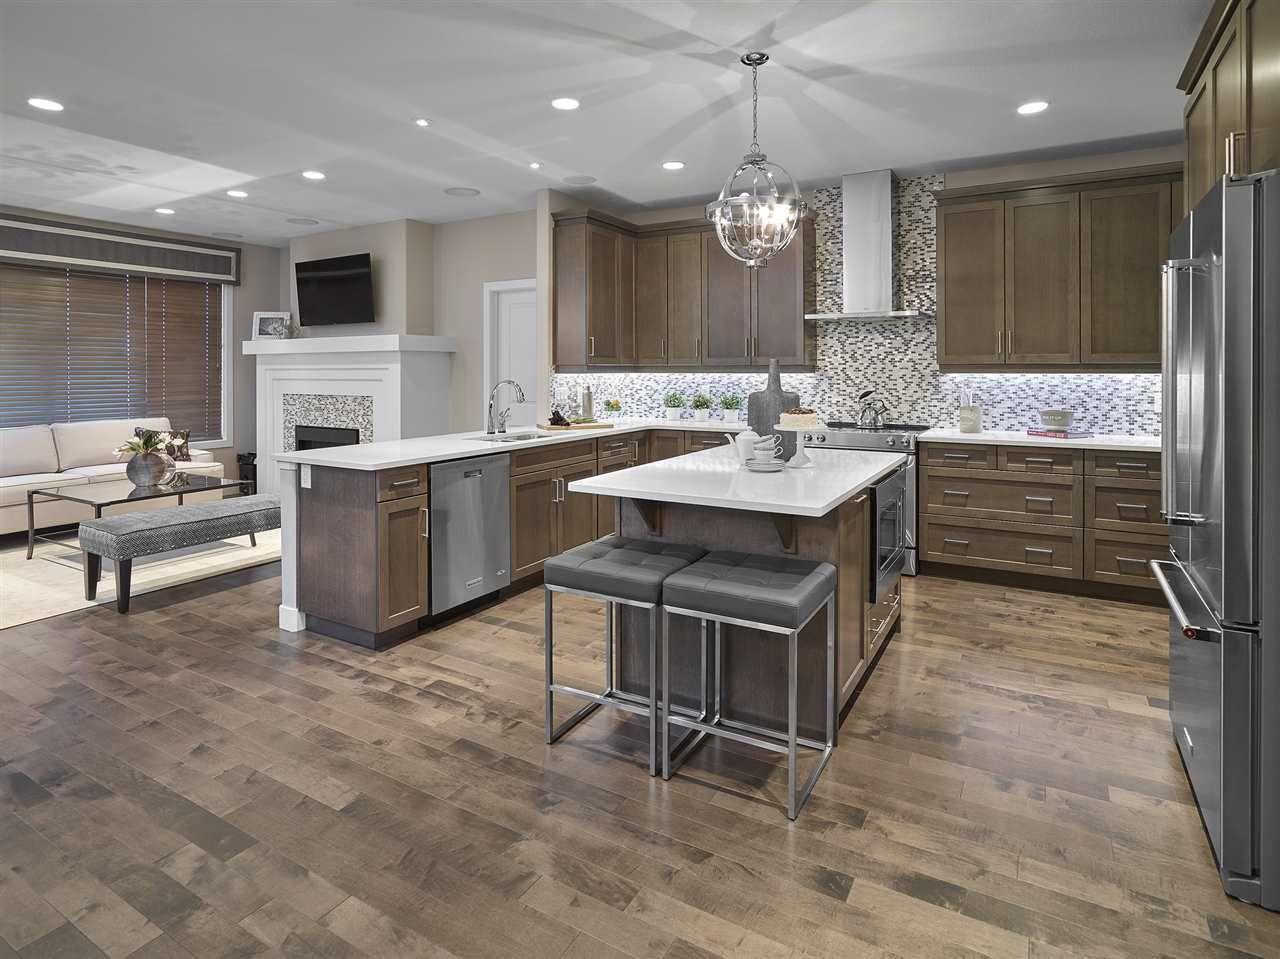 Main Photo: 92 Rybury Court: Sherwood Park House Half Duplex for sale : MLS®# E4134468